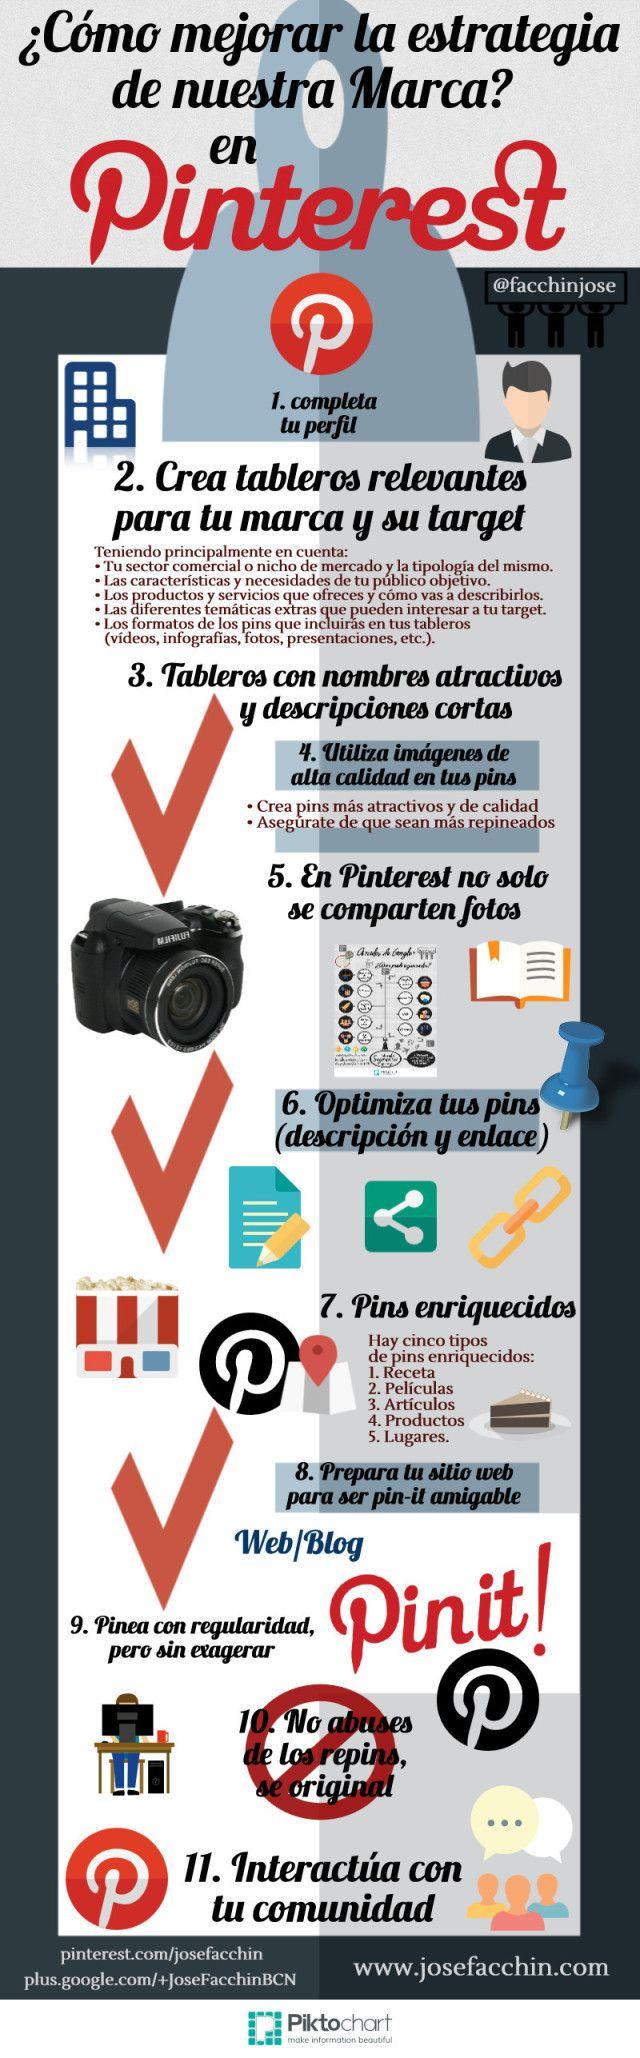 Cómo mejorar la estrategia de marca en Pinterest #infografia